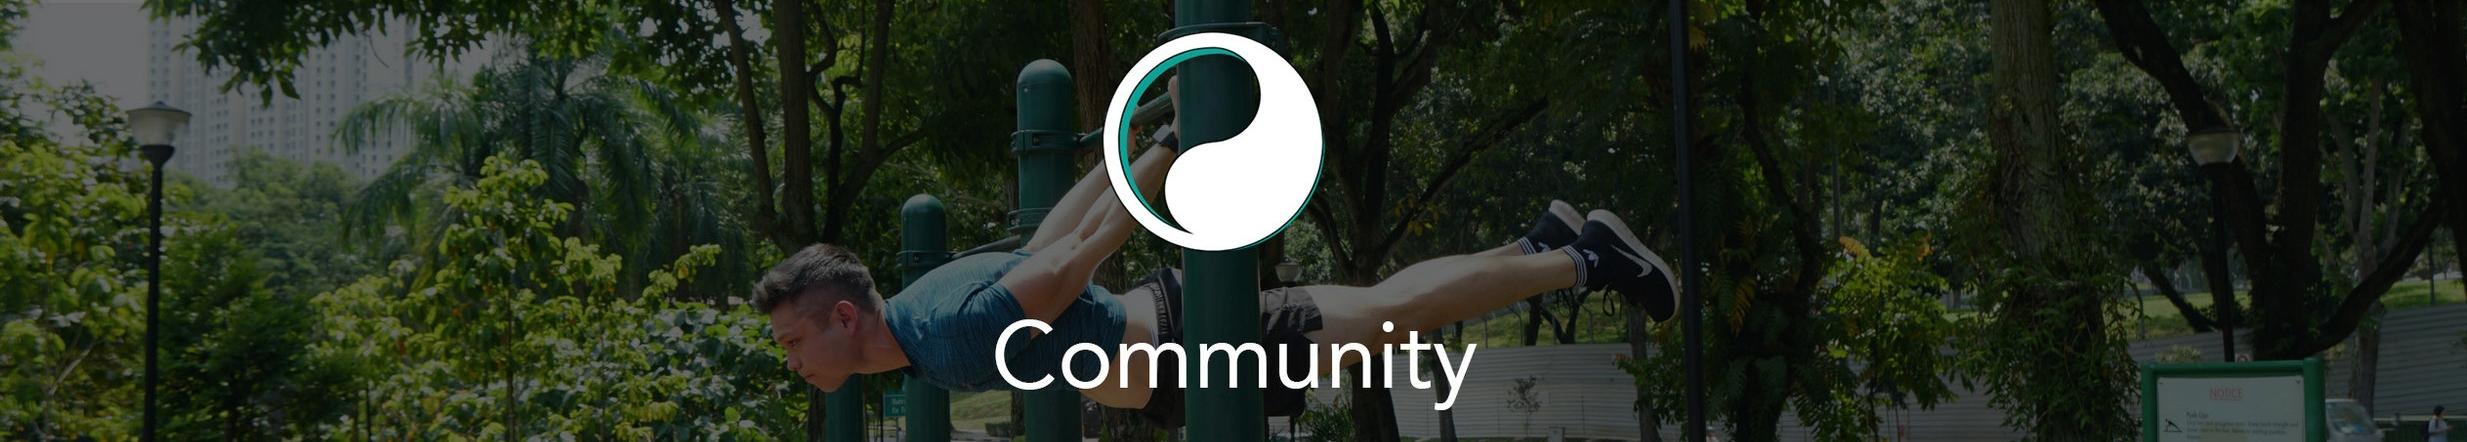 Holistic Community.jpg